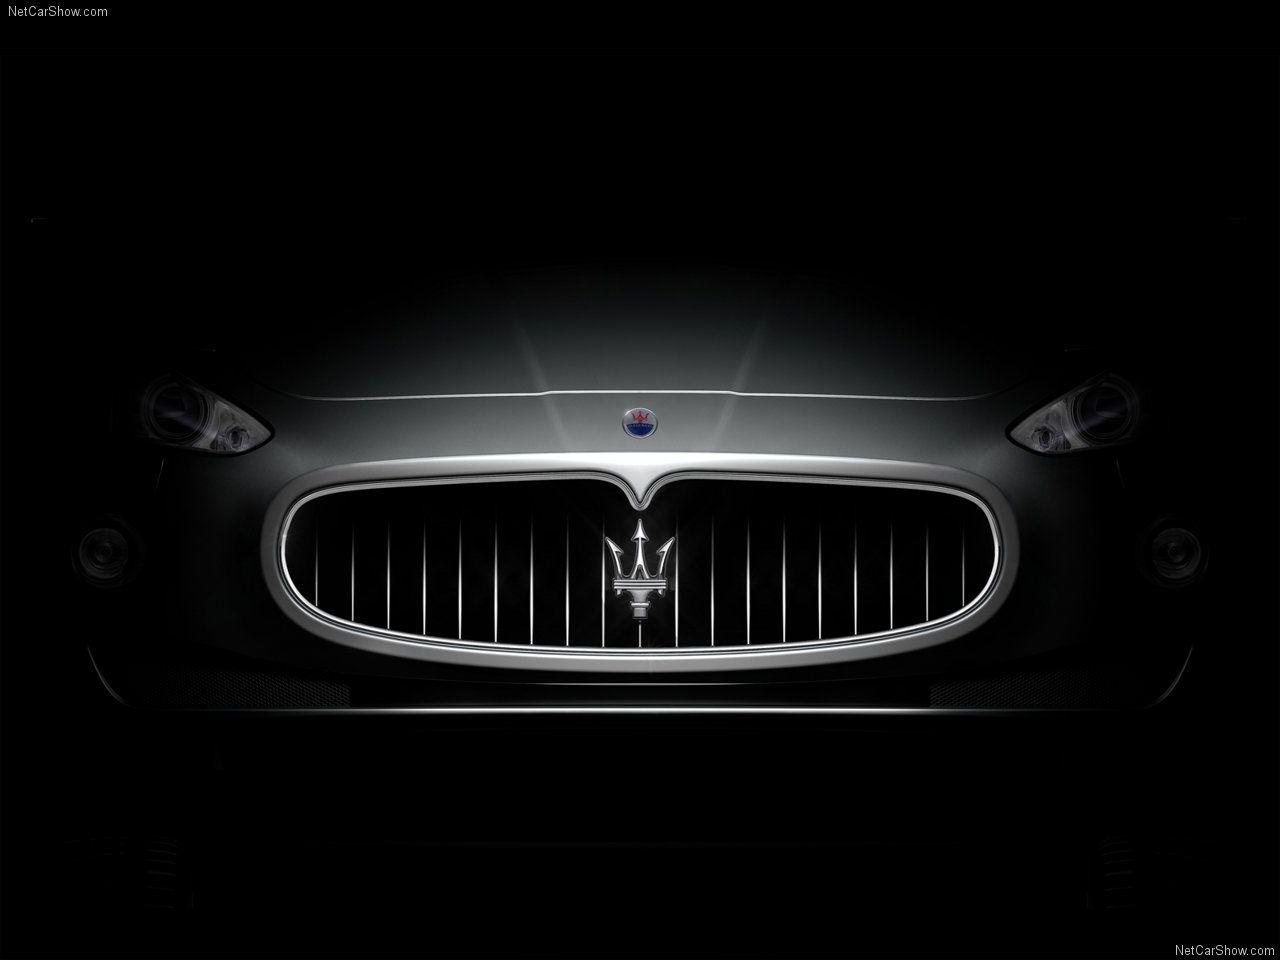 Maserati Logo in Grill Wallpaper HD Desktop Maserati car 1280x960